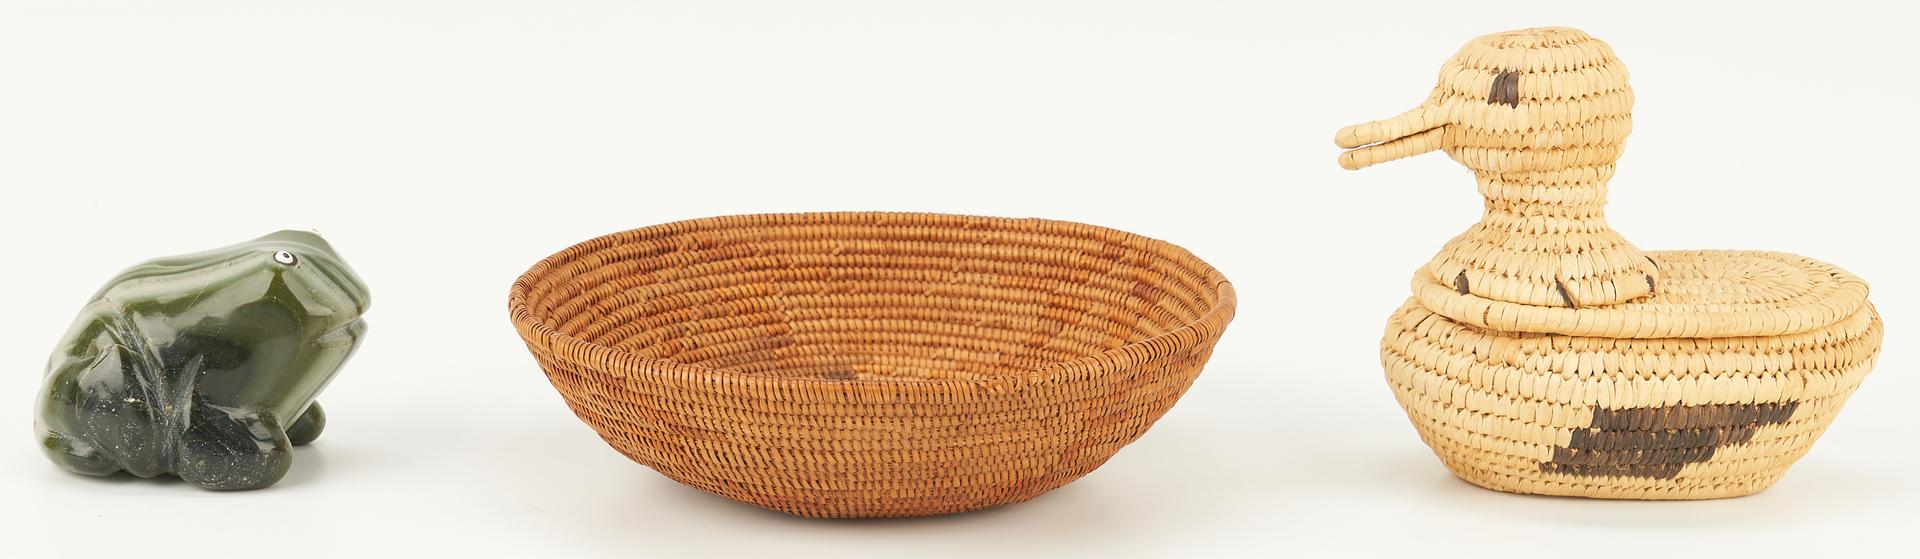 Lot 660: 5 Native American Decorative Items, incl. Papago & Hopi Baskets